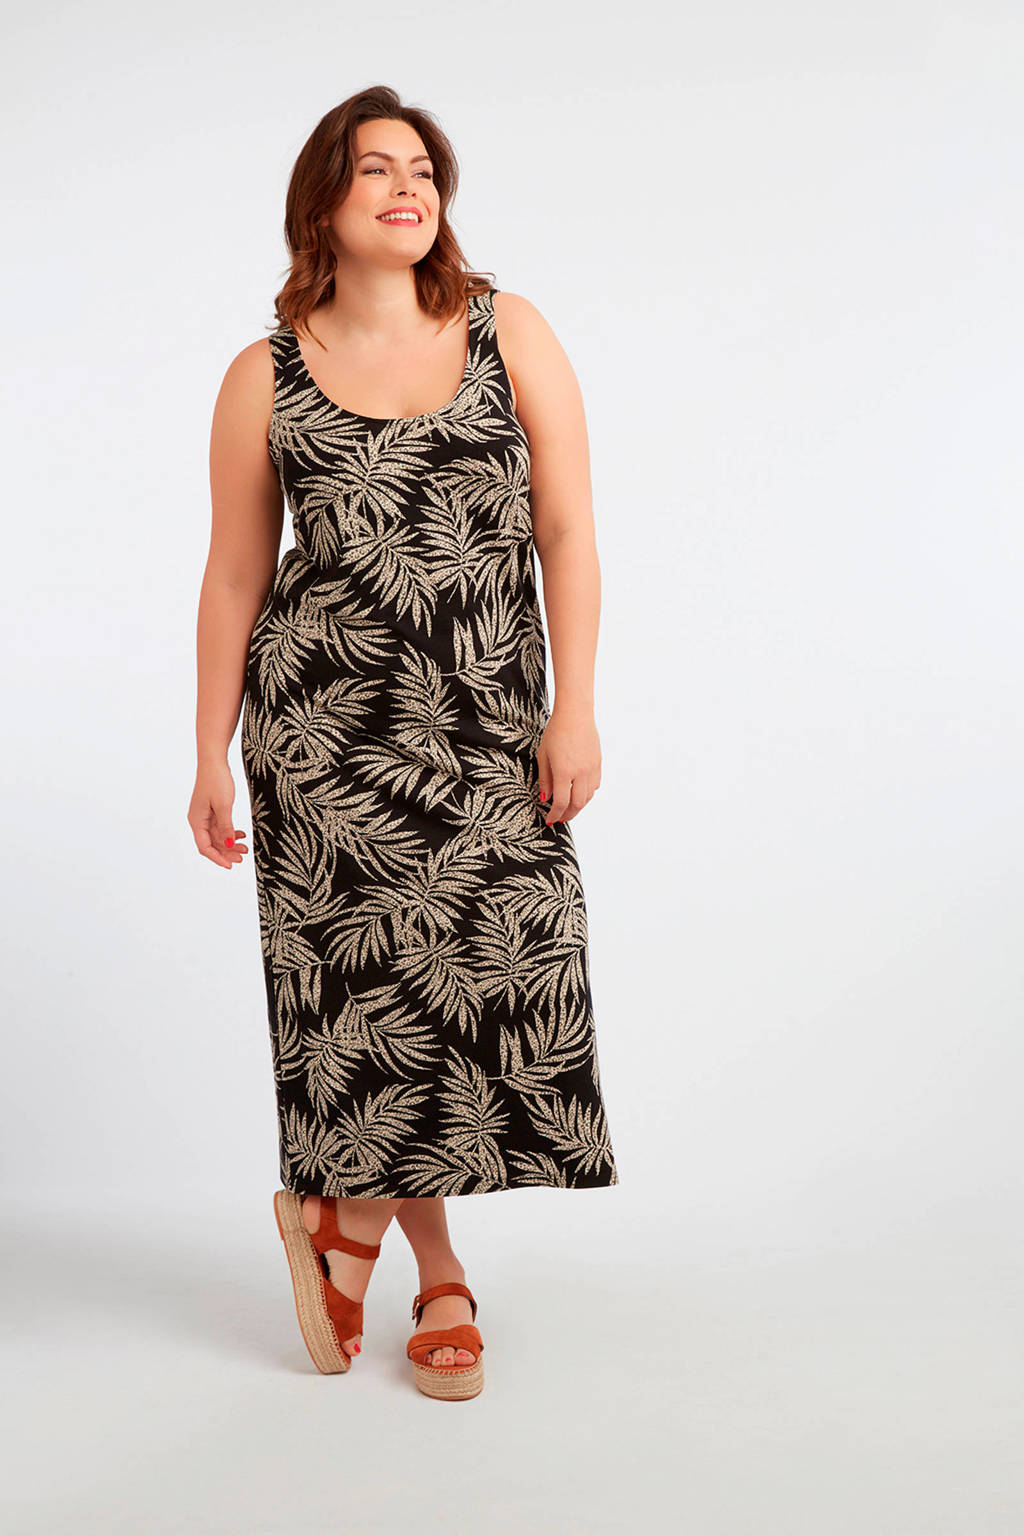 MS Mode jersey jurk met bladprint multi grijs-zwart, Multi Grijs-Zwart